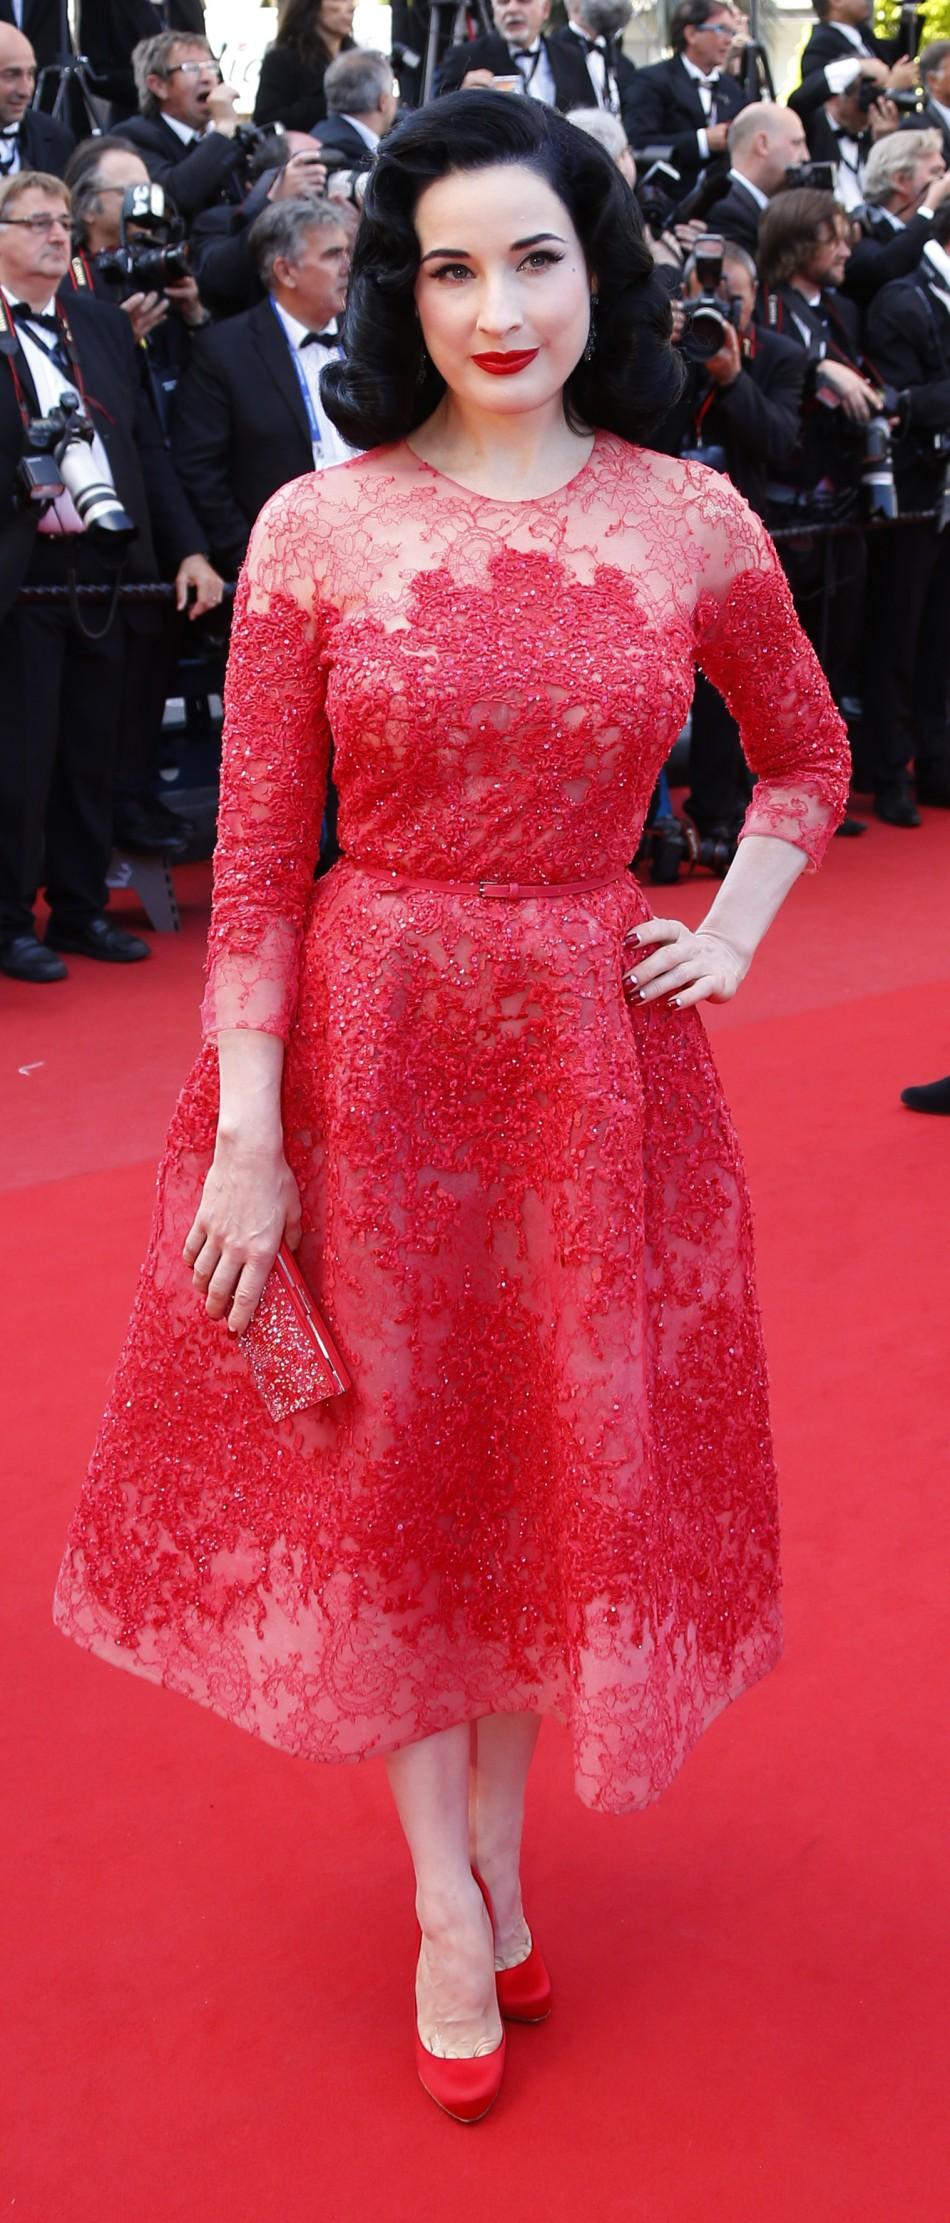 Cannes Film Festival 2013 Celebrities on Red Carpet